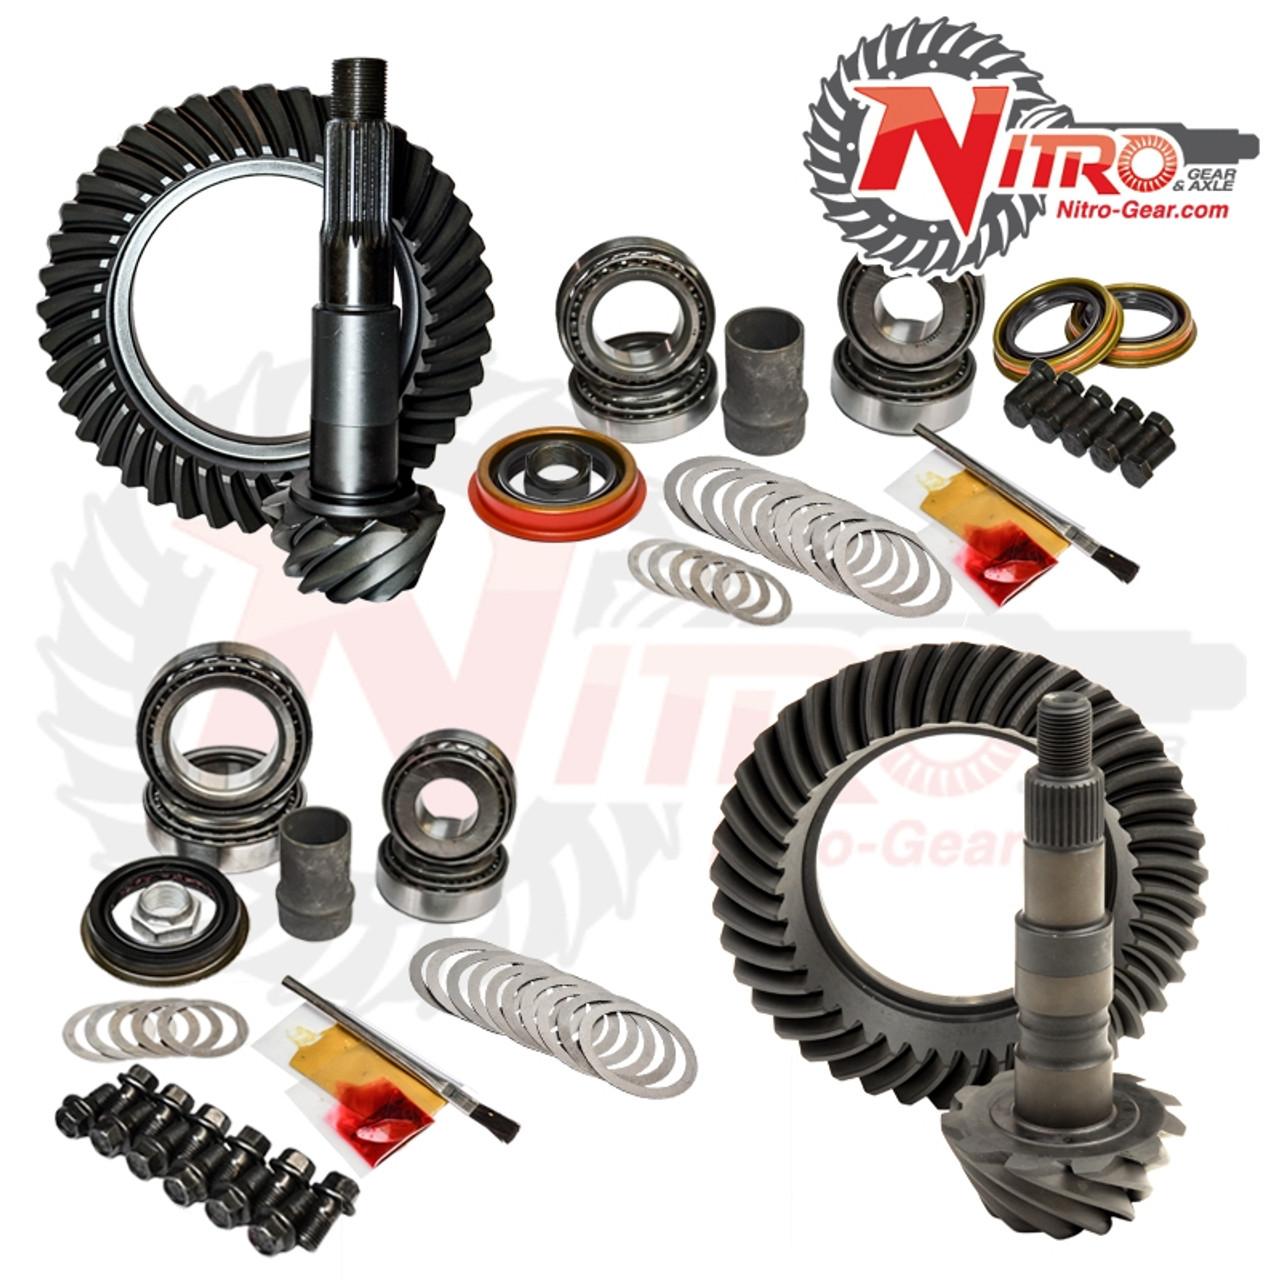 Silverado/Sierra Gear Package Kit 01-10 Chevrolet/GMC 2500 and 3500HD Diesel or 8.1L 4.88 Ratio Nitro Gear and Axle